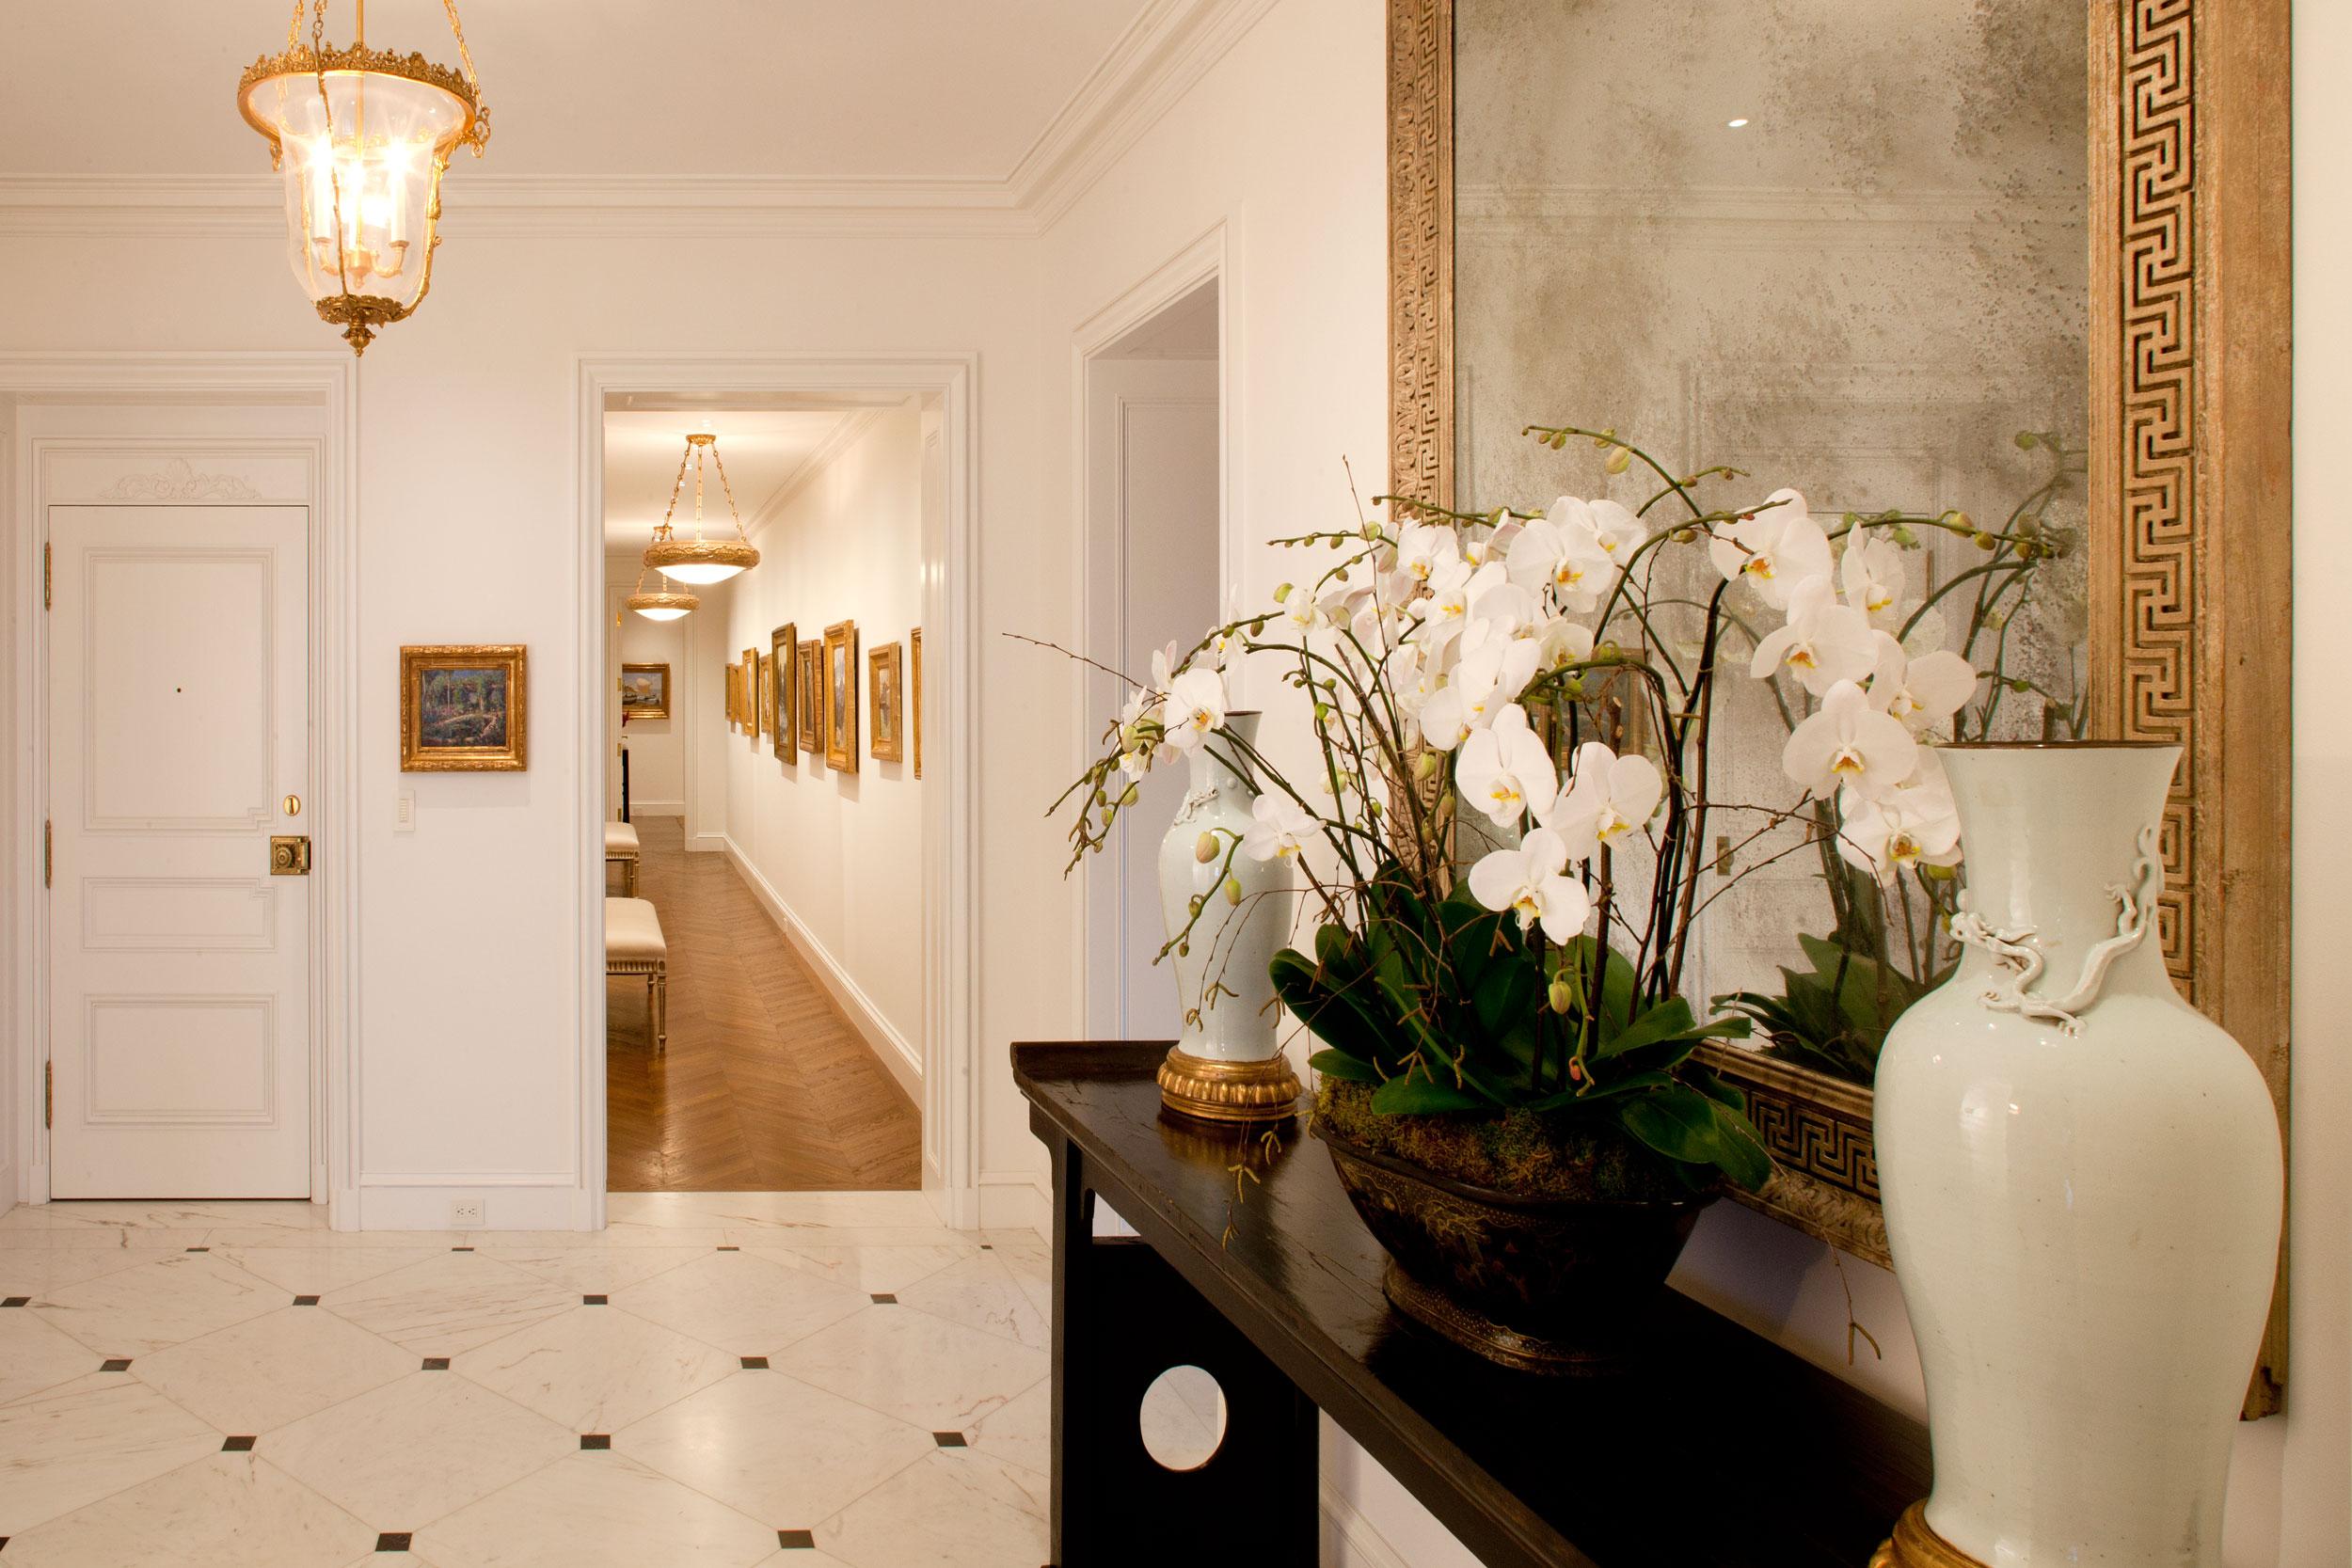 Elegant and classical remodel of this full-floor condo in San Francisco